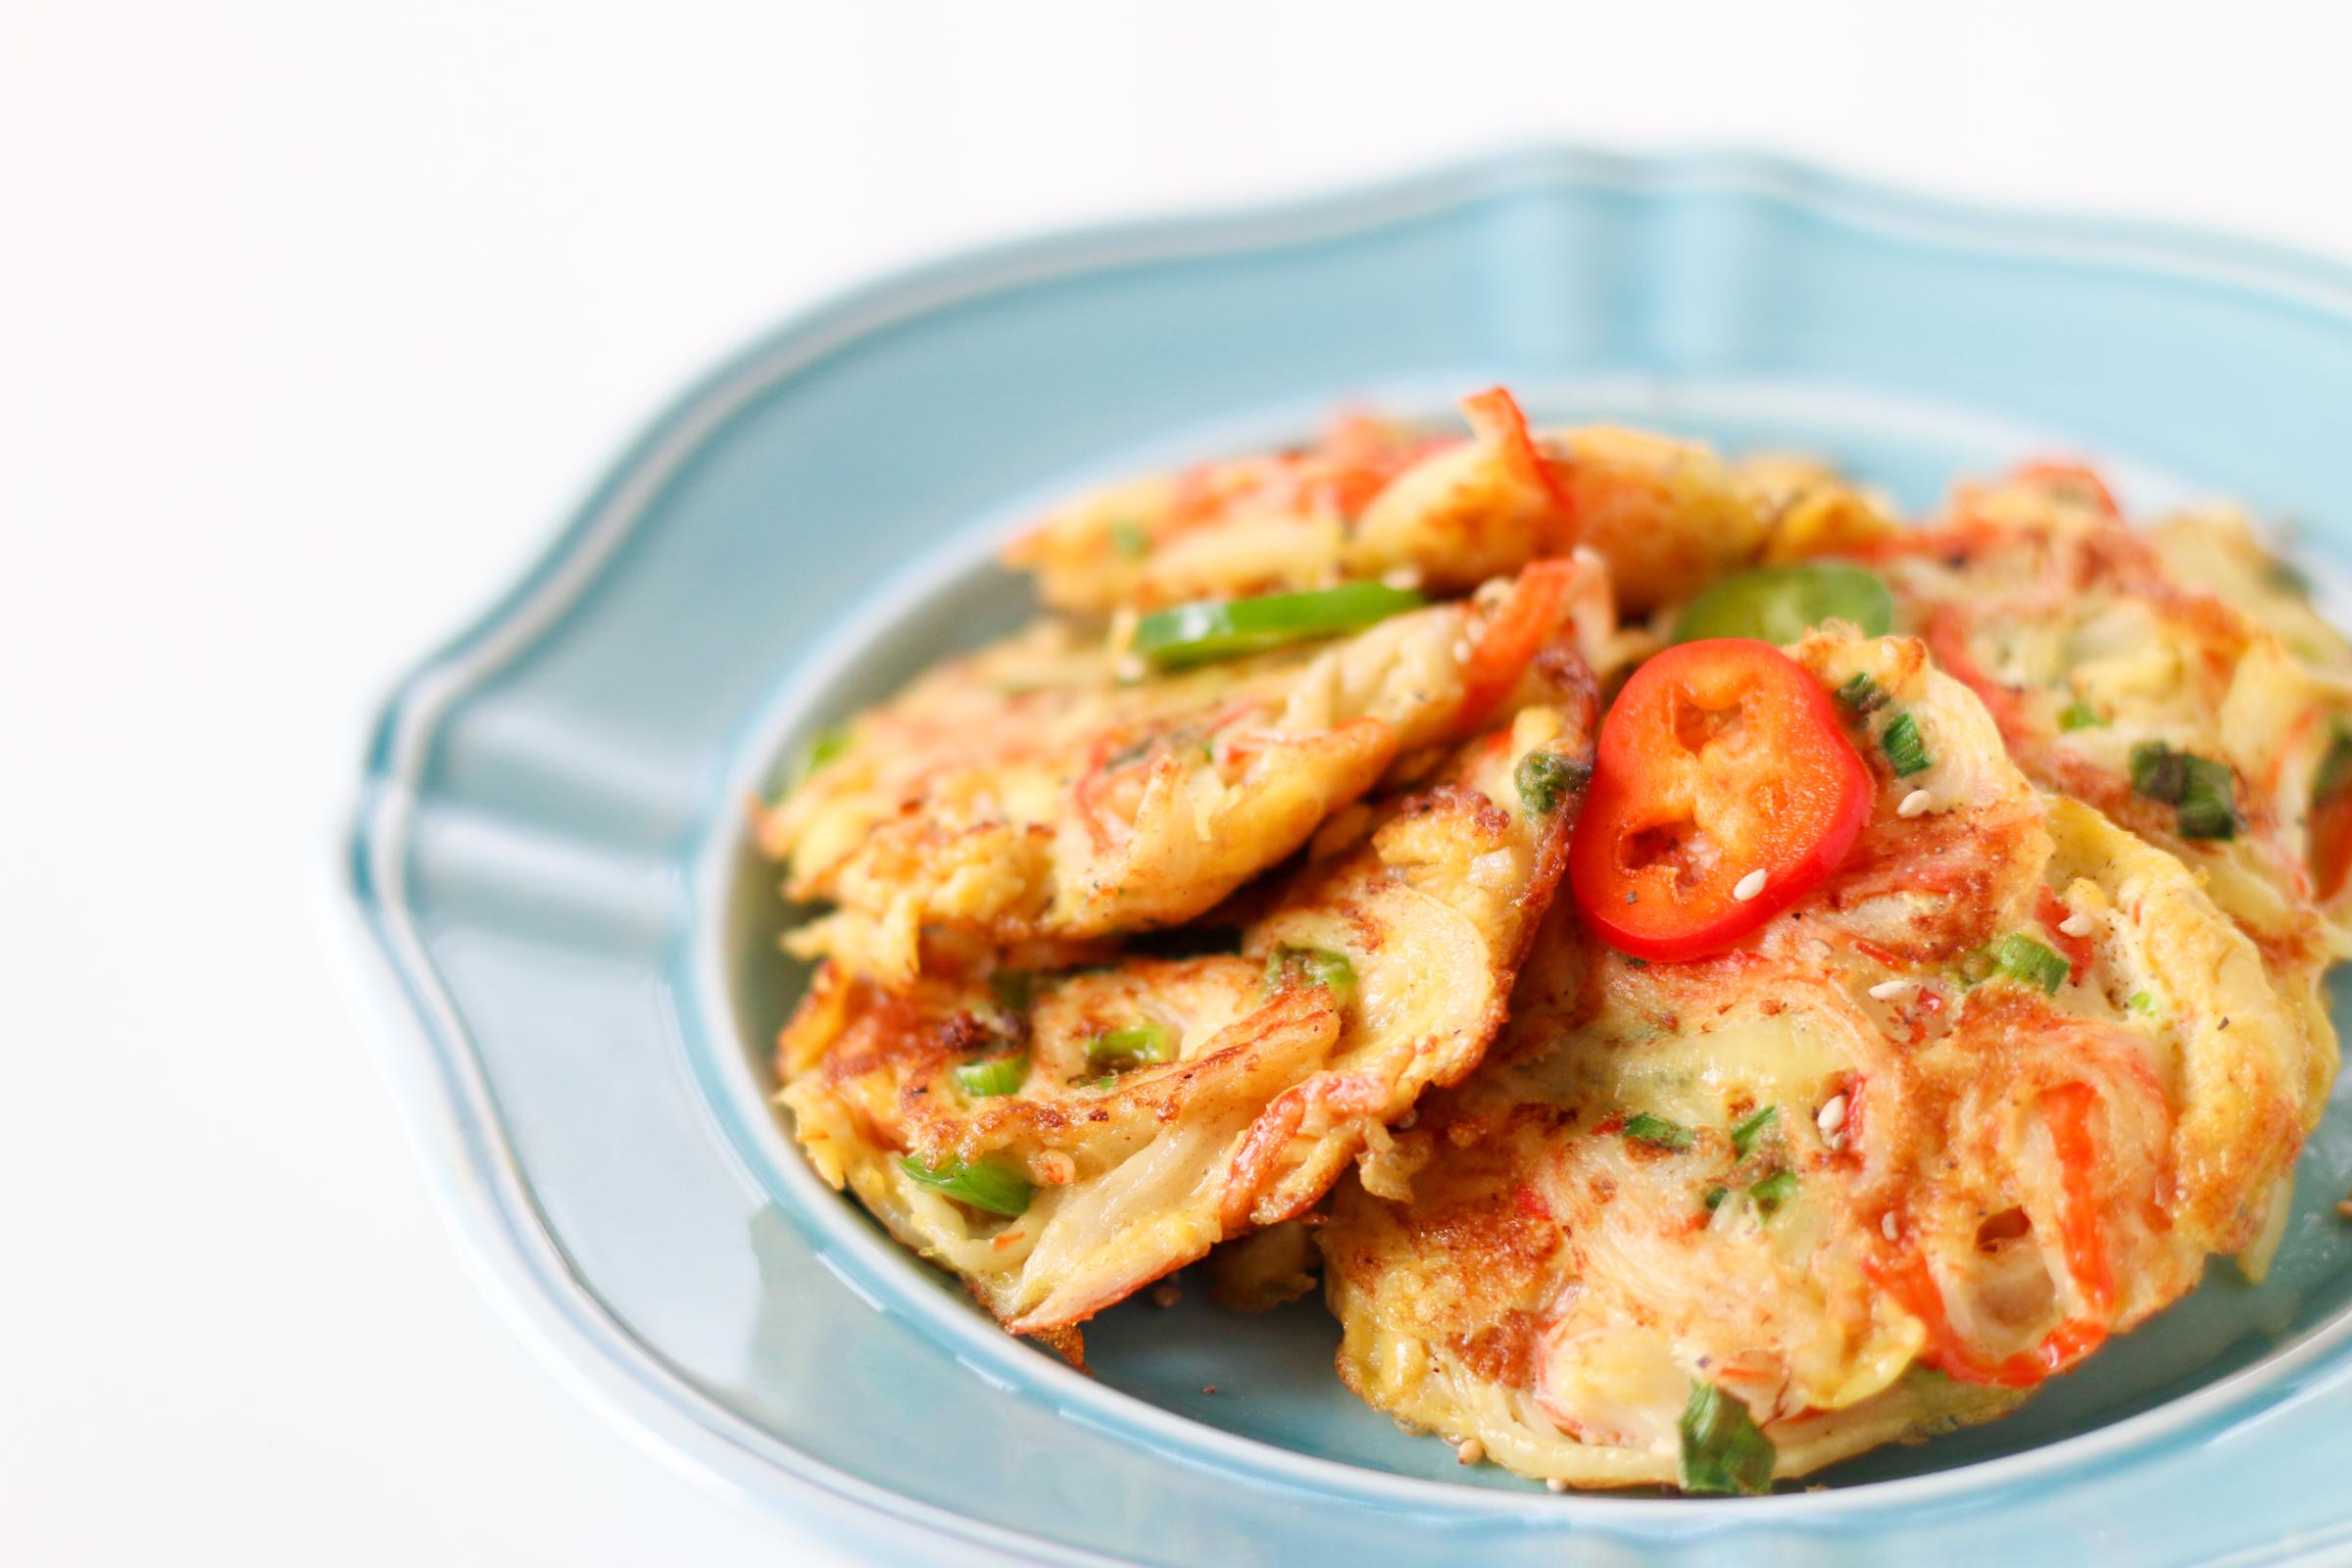 Korean Crab Jeon Crab Stick Omelettes 게맛살전 Chef Julie Yoon